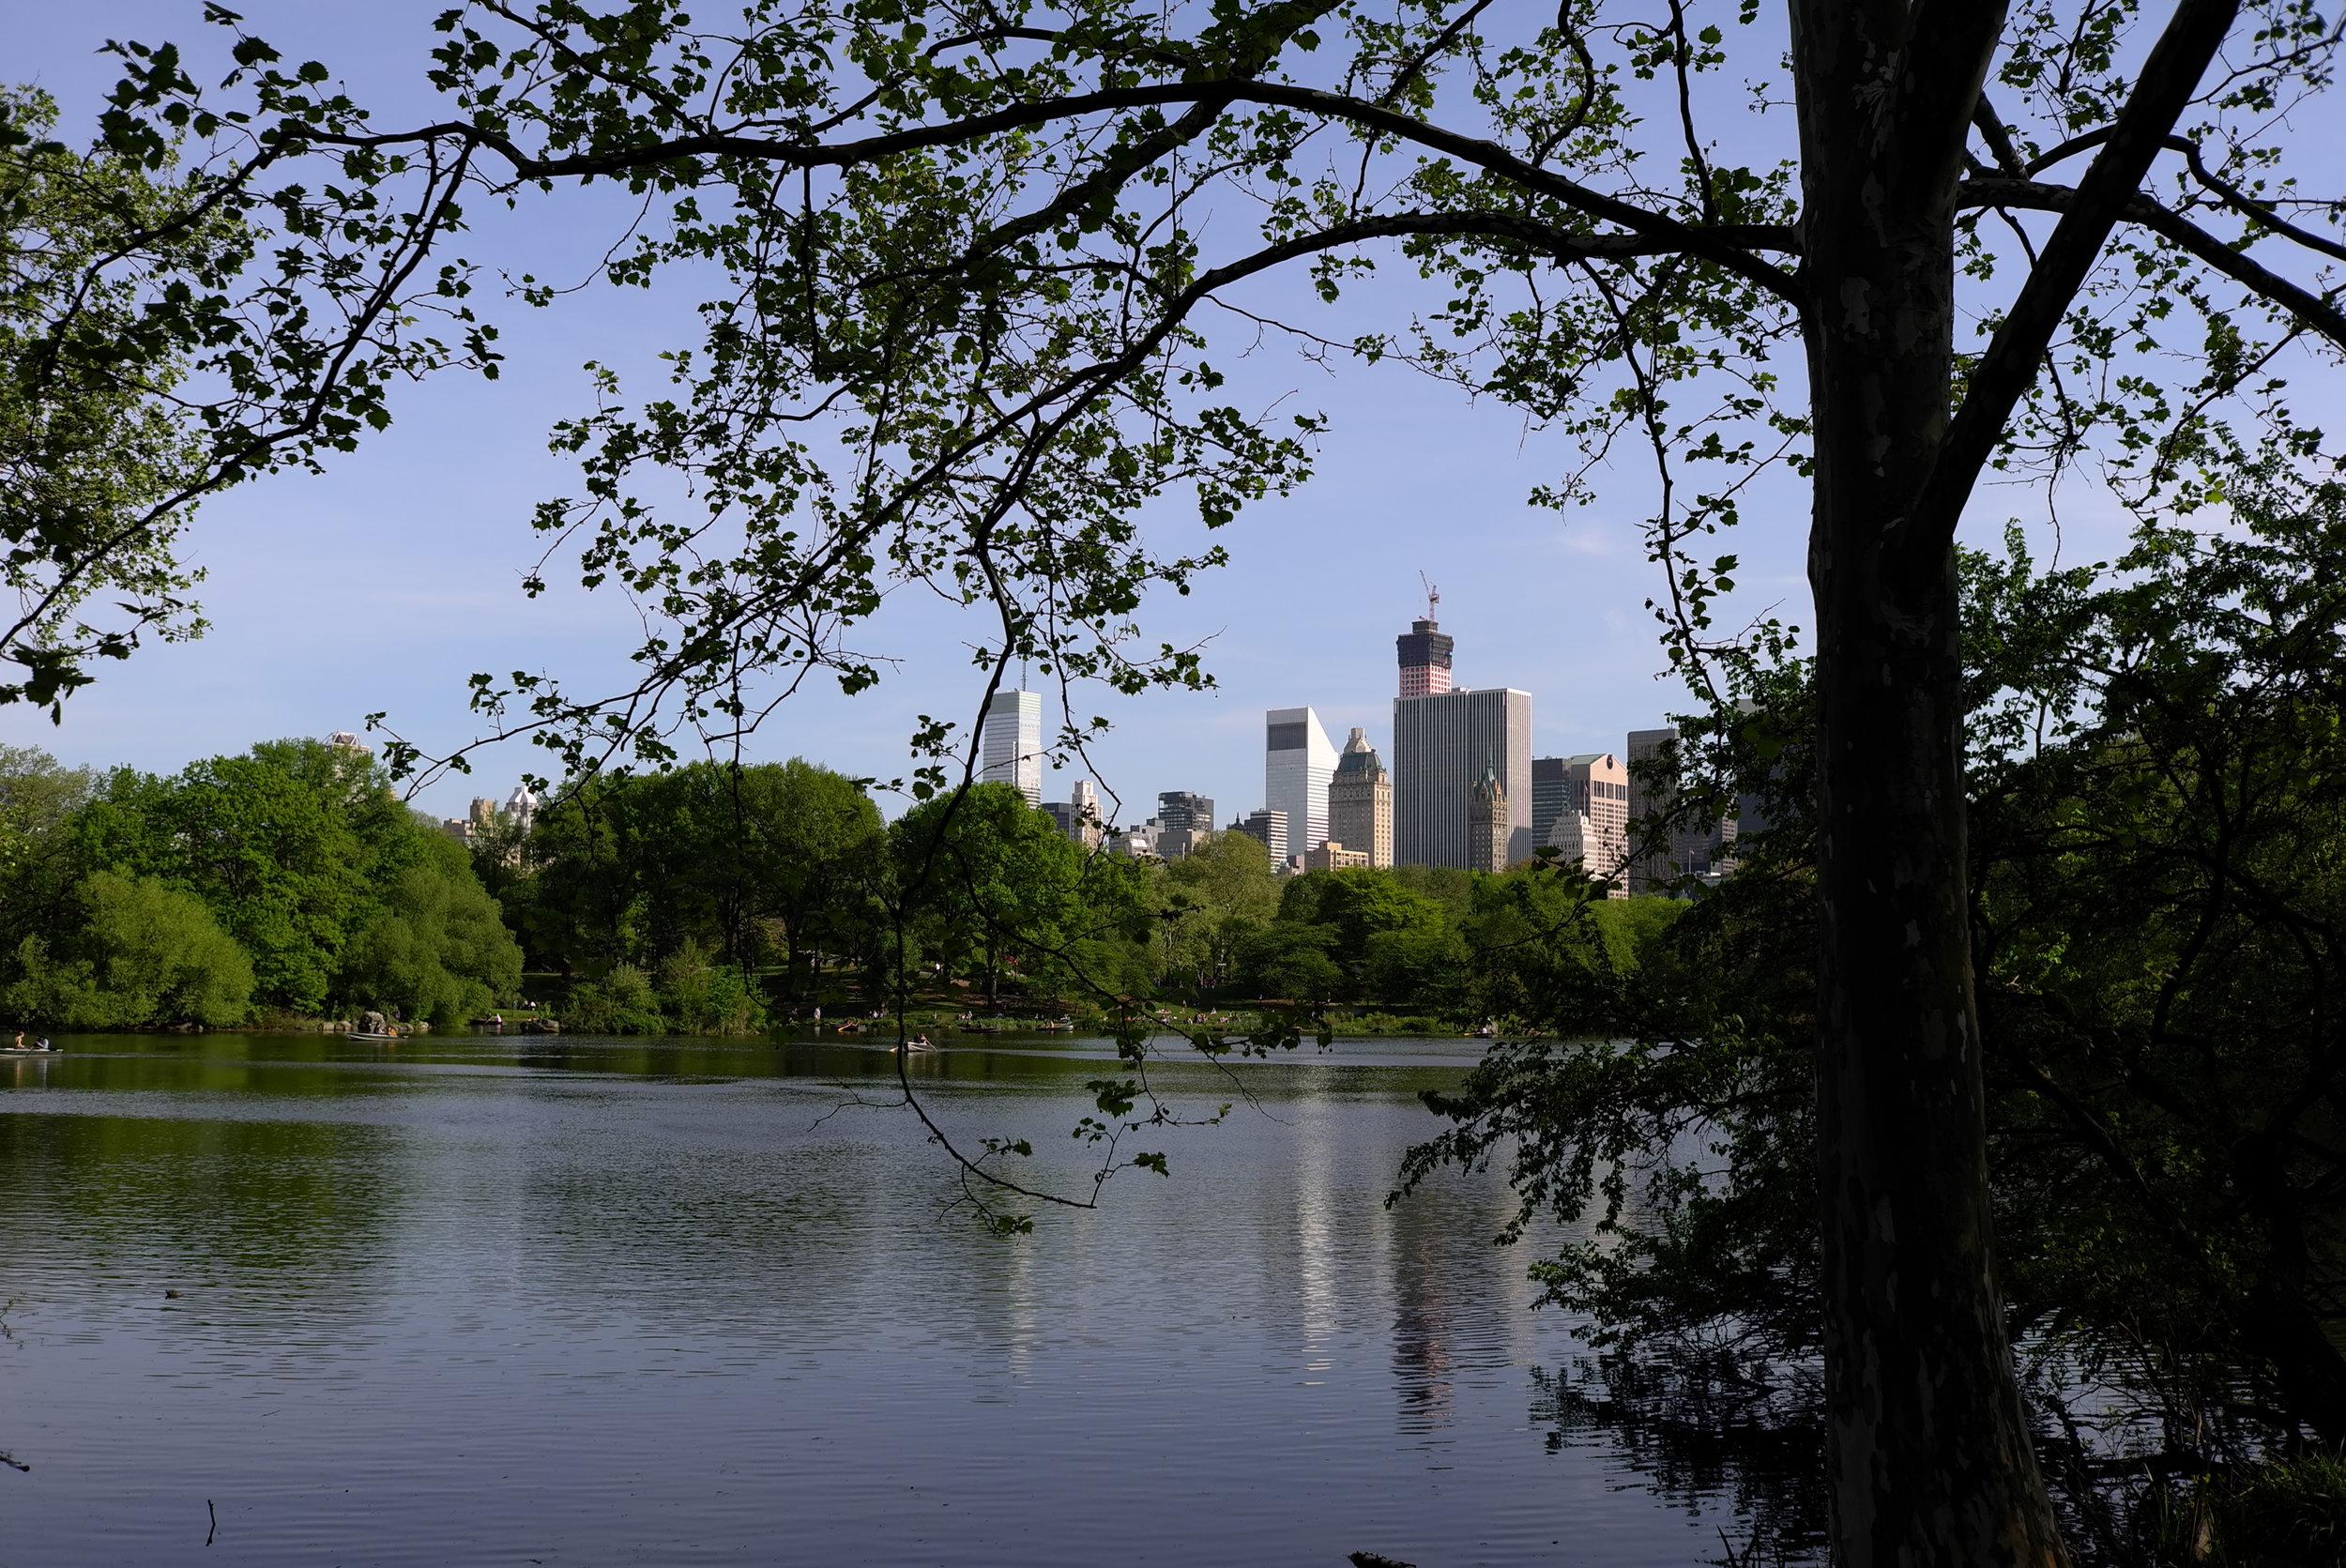 Lozidaze_NYC_Central-Park